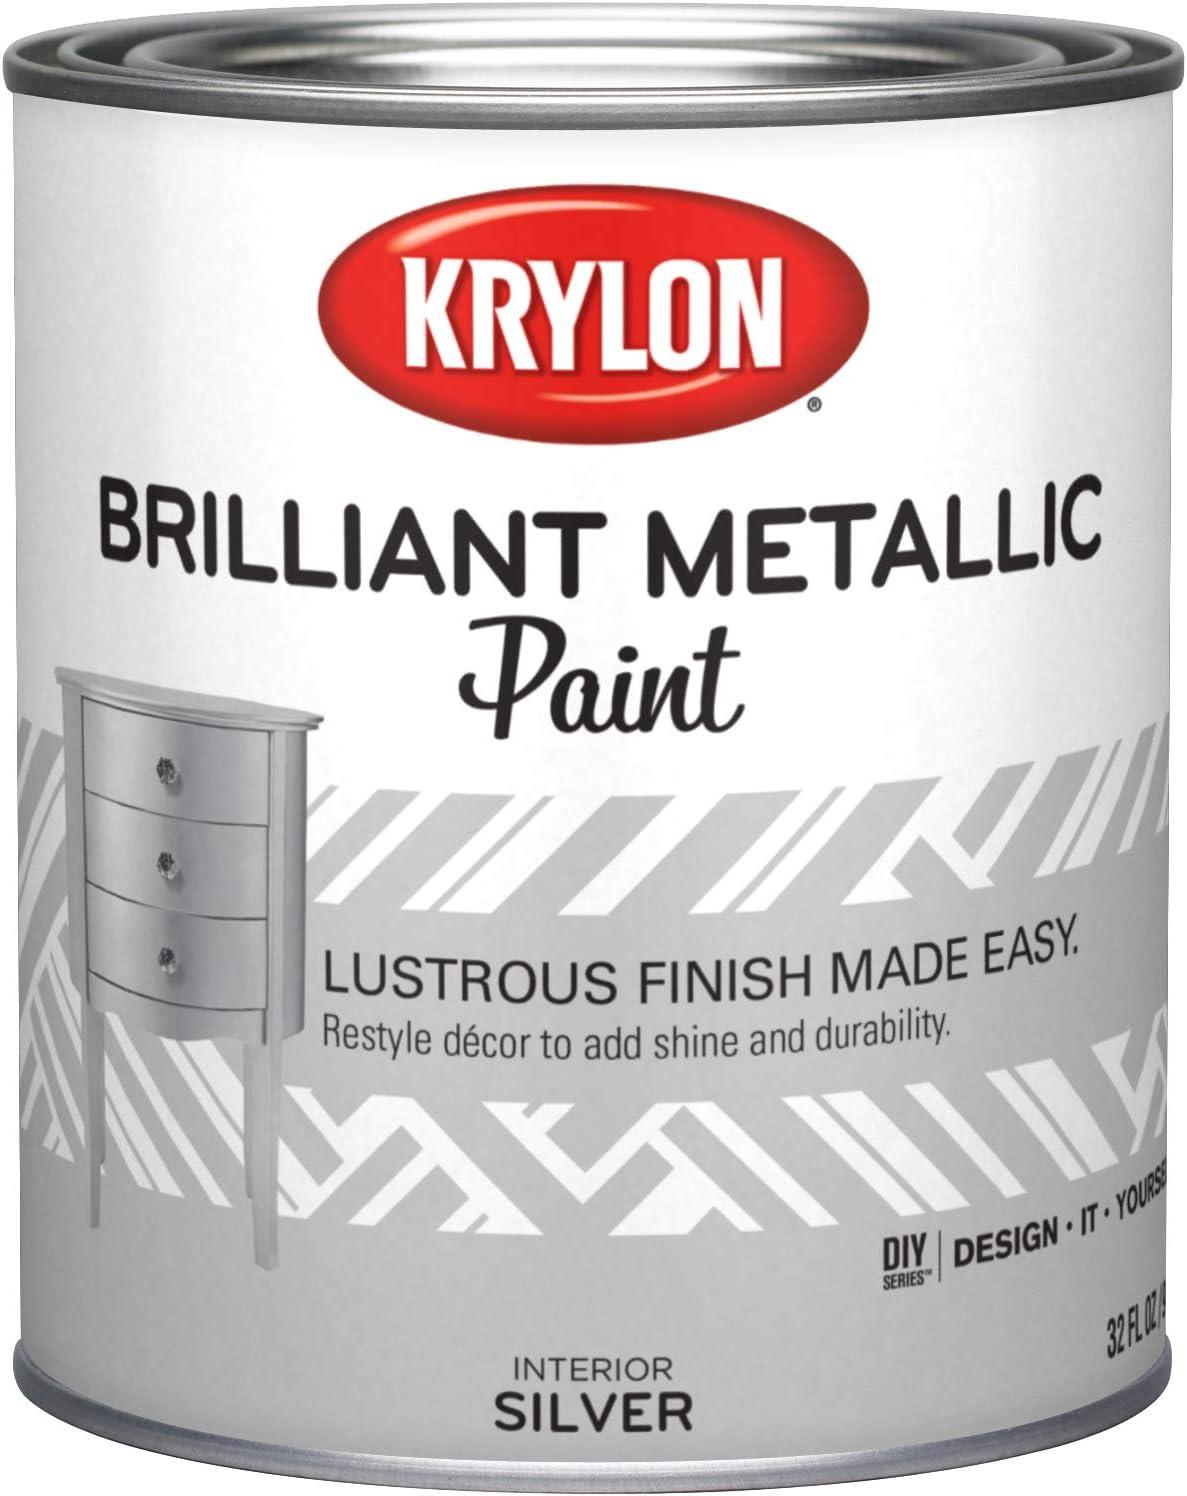 Krylon K02226000-14 Brilliant Metallic, Quart, Silver